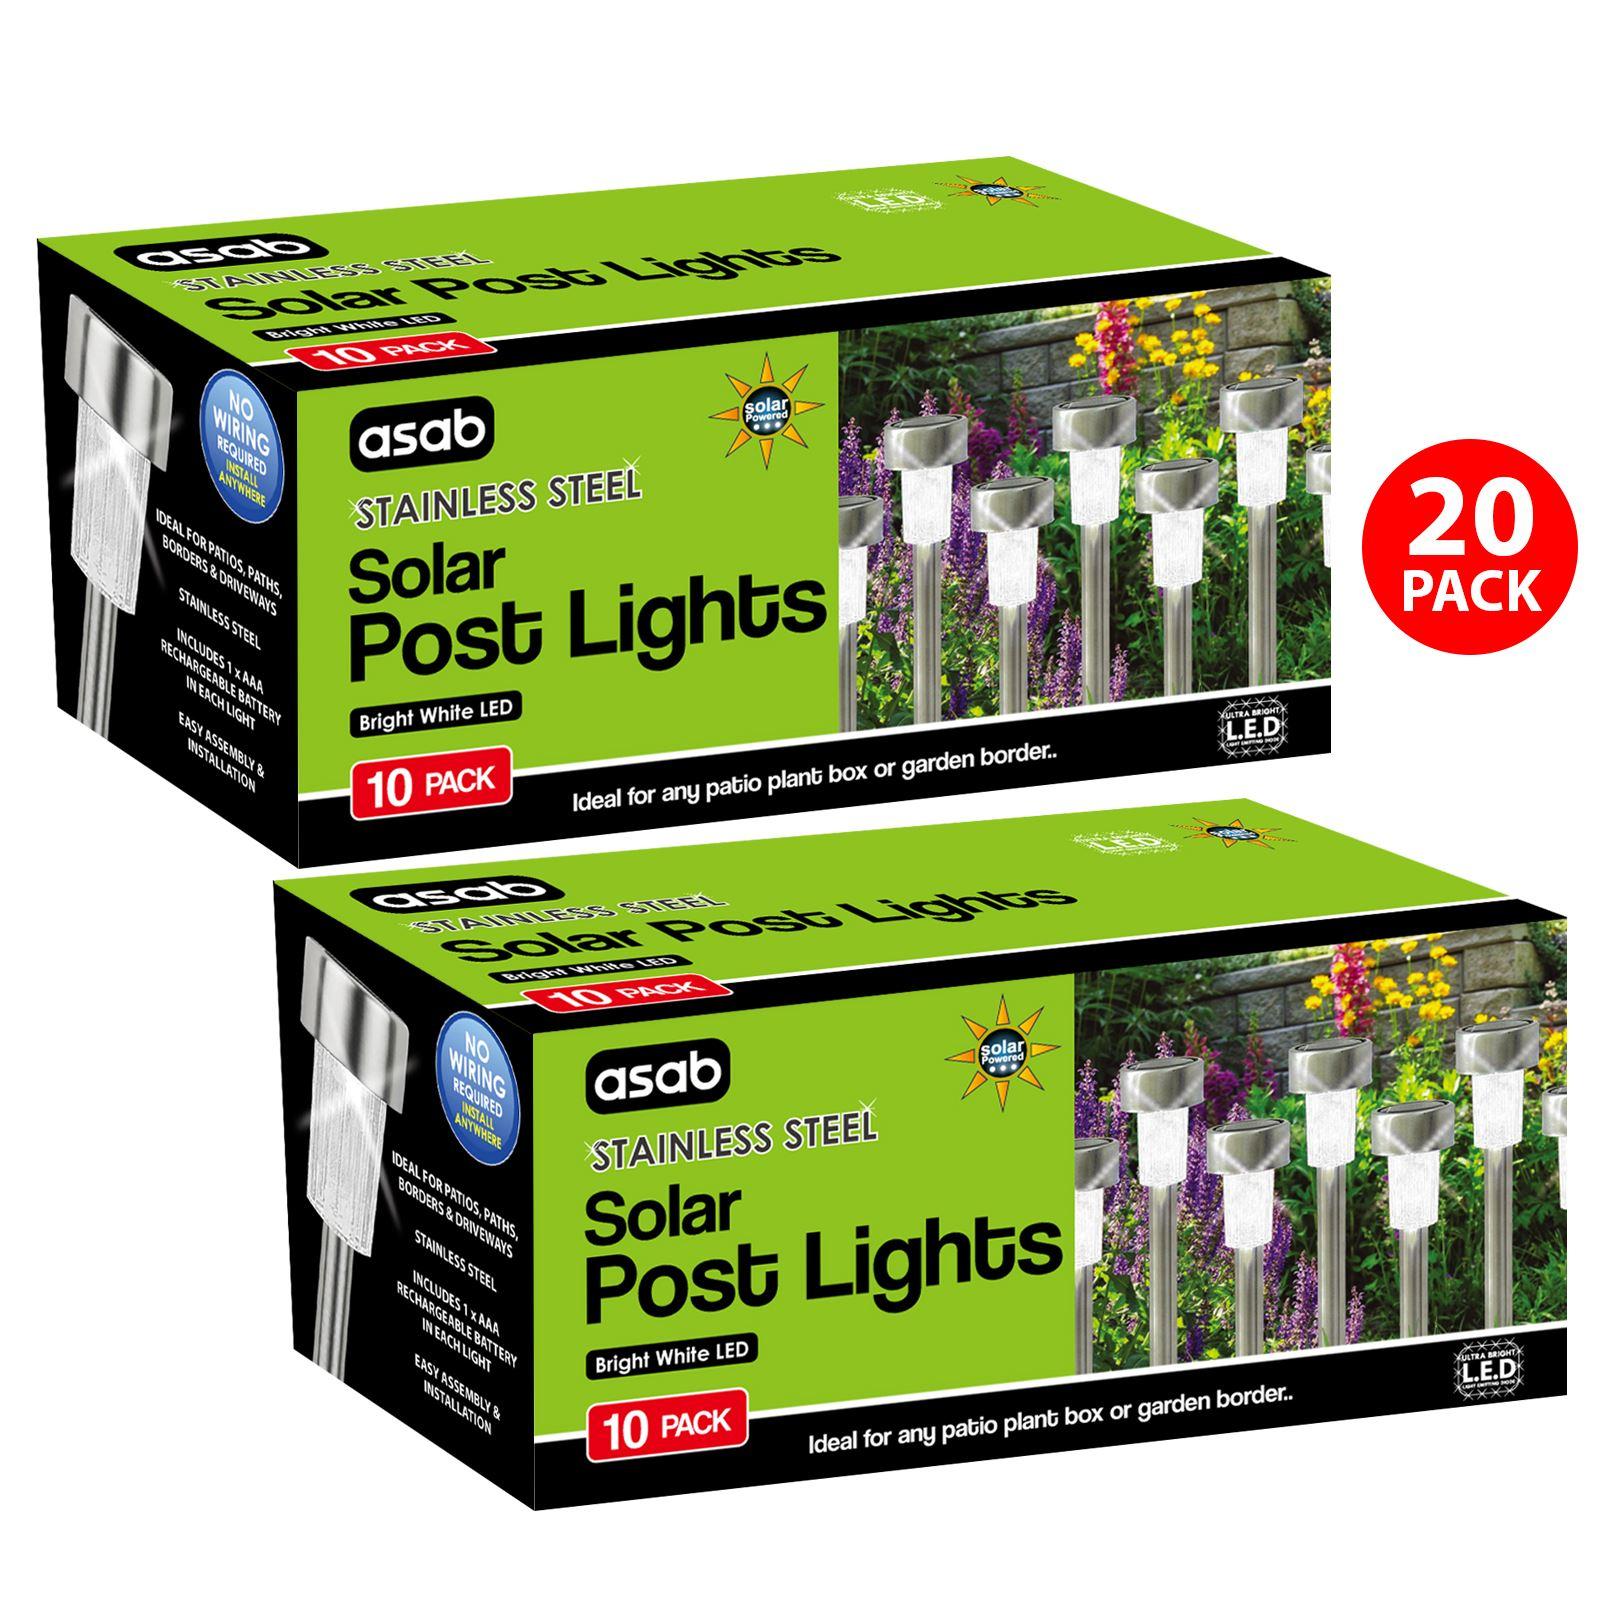 ASAB-10-x-Solar-Powered-Stainless-Steel-Garden-Post-Lights-LED-Outdoor-Lighting thumbnail 20